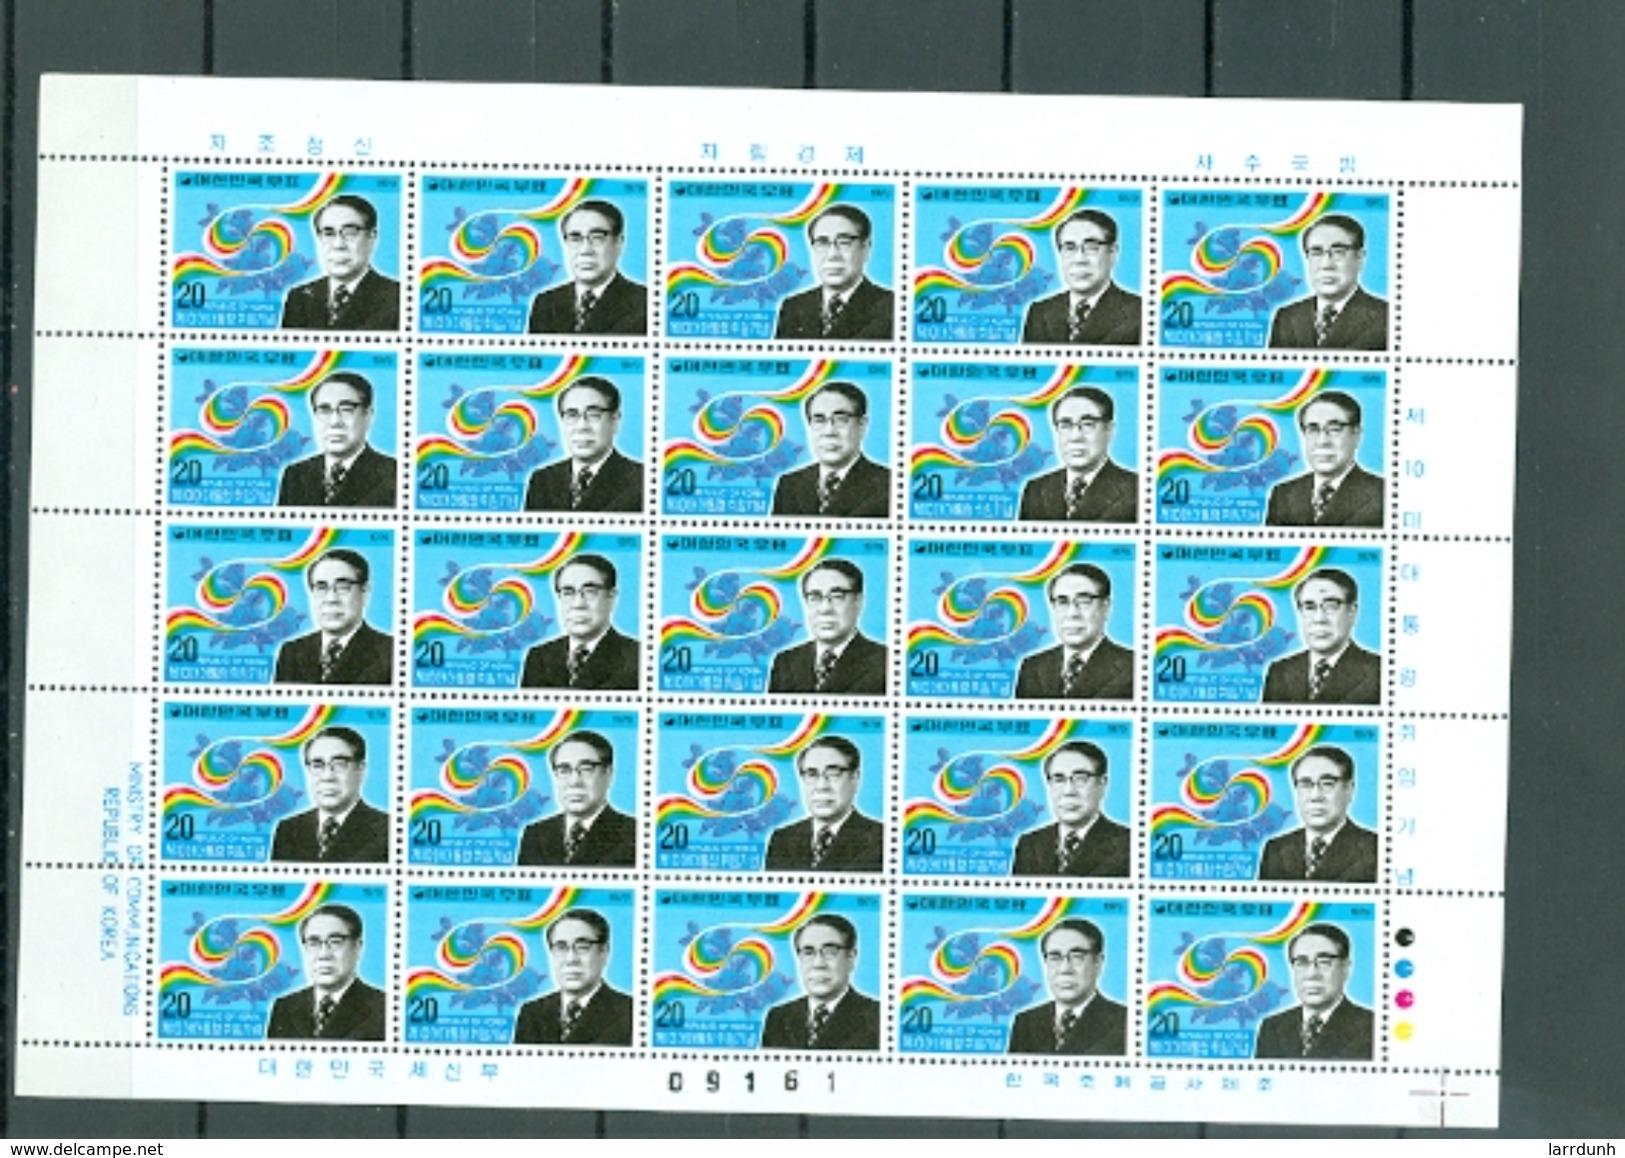 Korea 1186 Inauguration Of President Choi Kyu-hah Unfolded Sheet Of 20 MNH WYSIWYG 1979 A04s - Korea, South